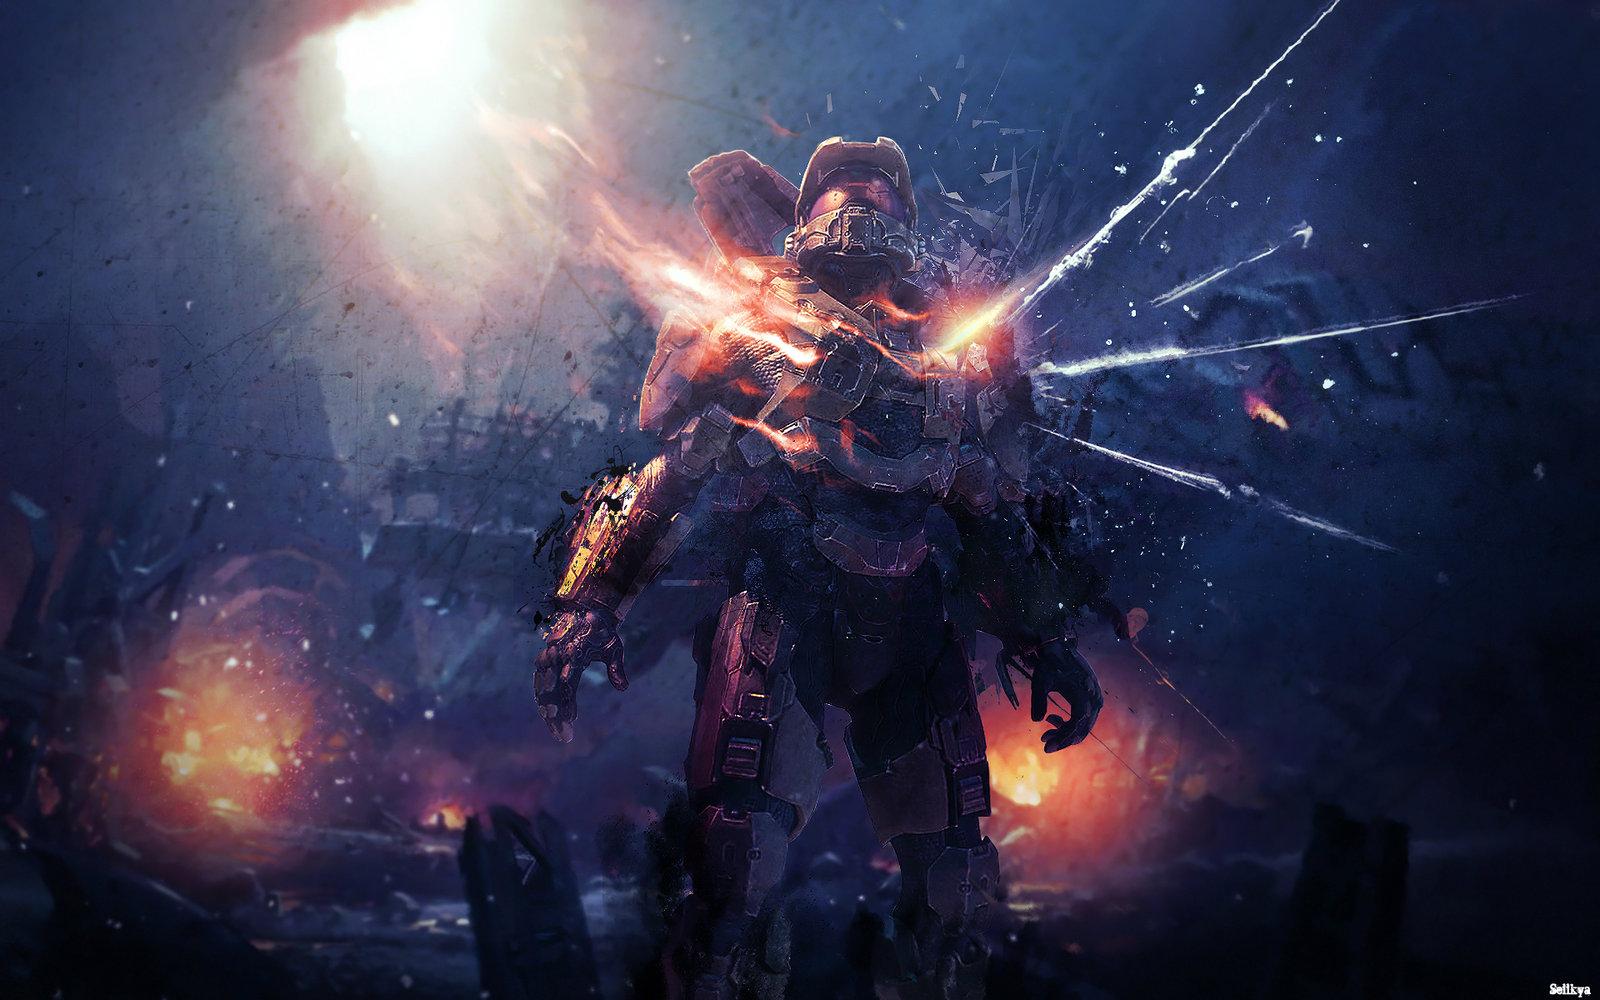 Halo 5 Guardians wallpaper 1